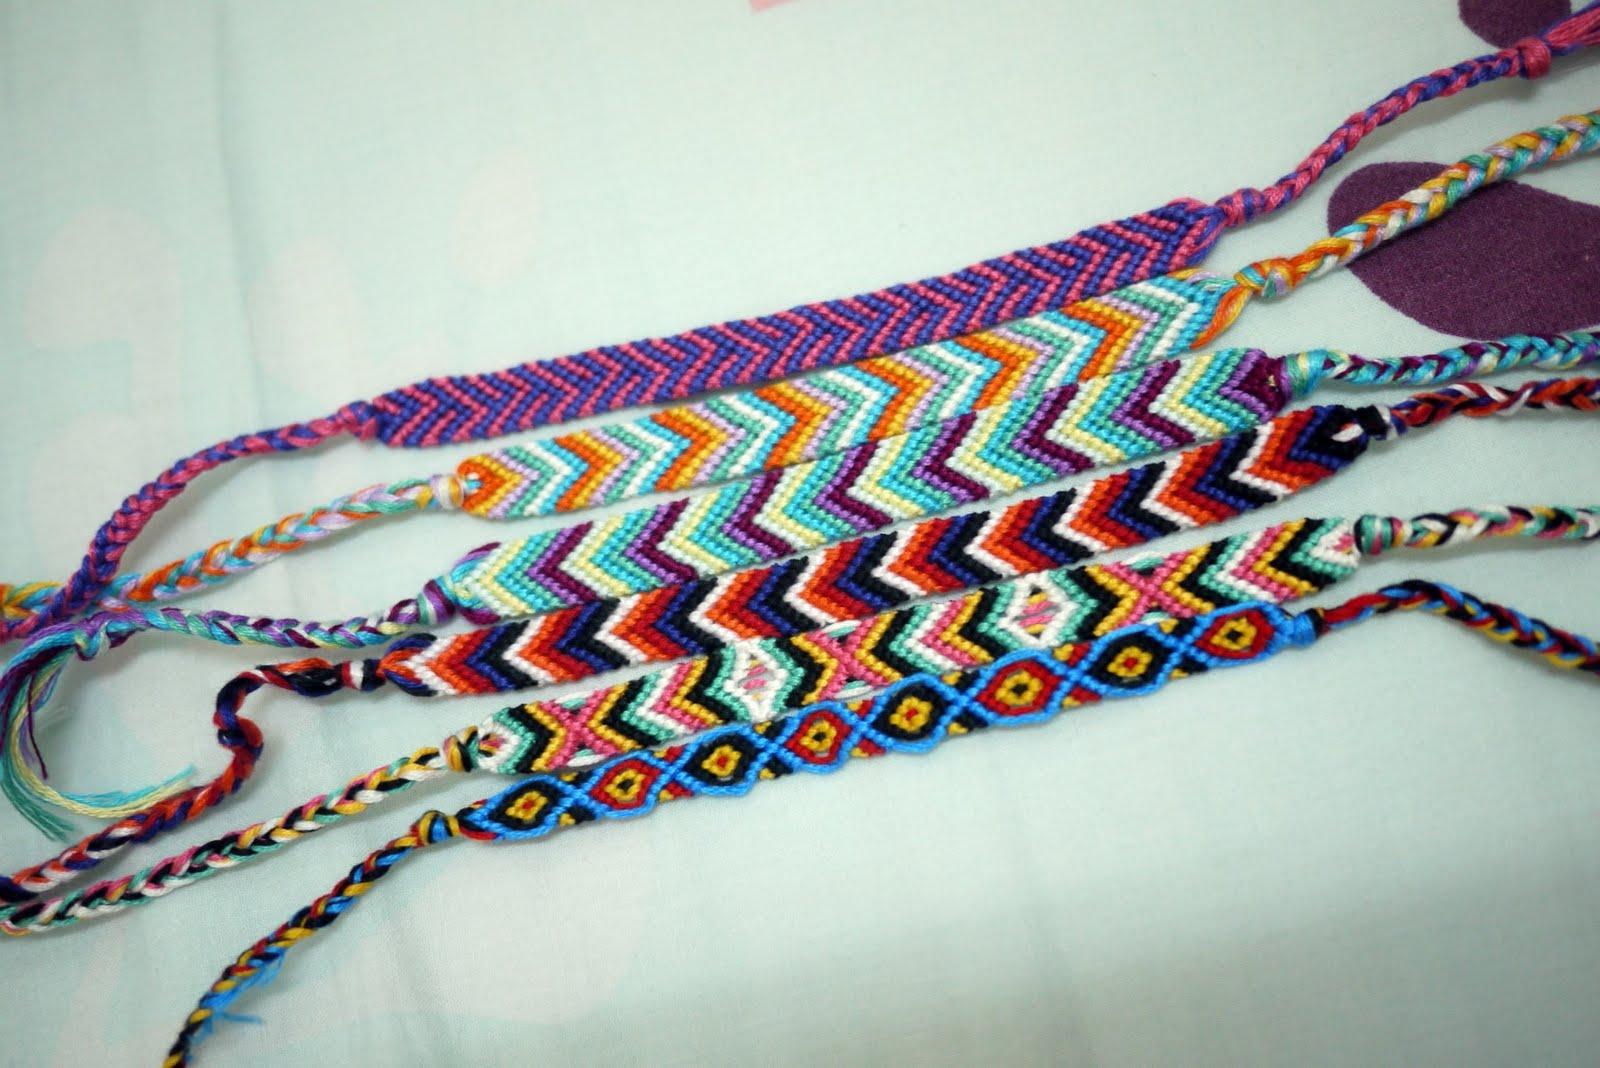 How to make chevron friendship bracelet - Diy Friendship Bracelets